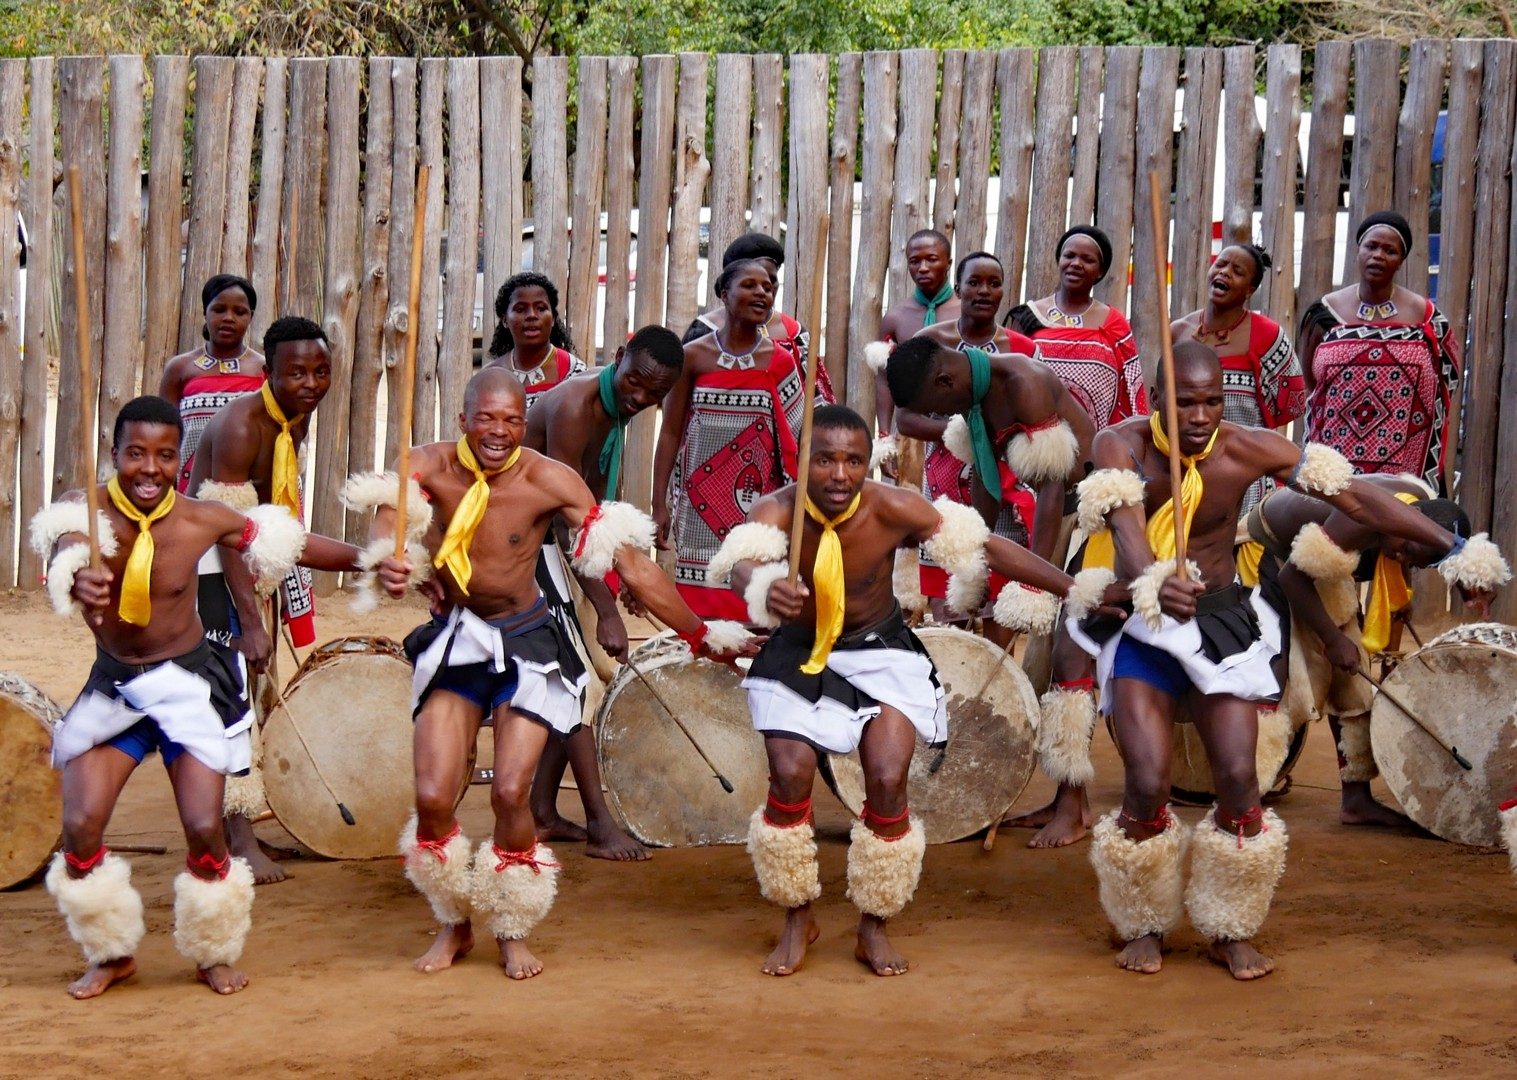 kingdom-of-eswatin-africa-swaziland-cycling-holiday.jpg - Swaziland (Eswatini) - Cycling Safari - Cycling Adventures